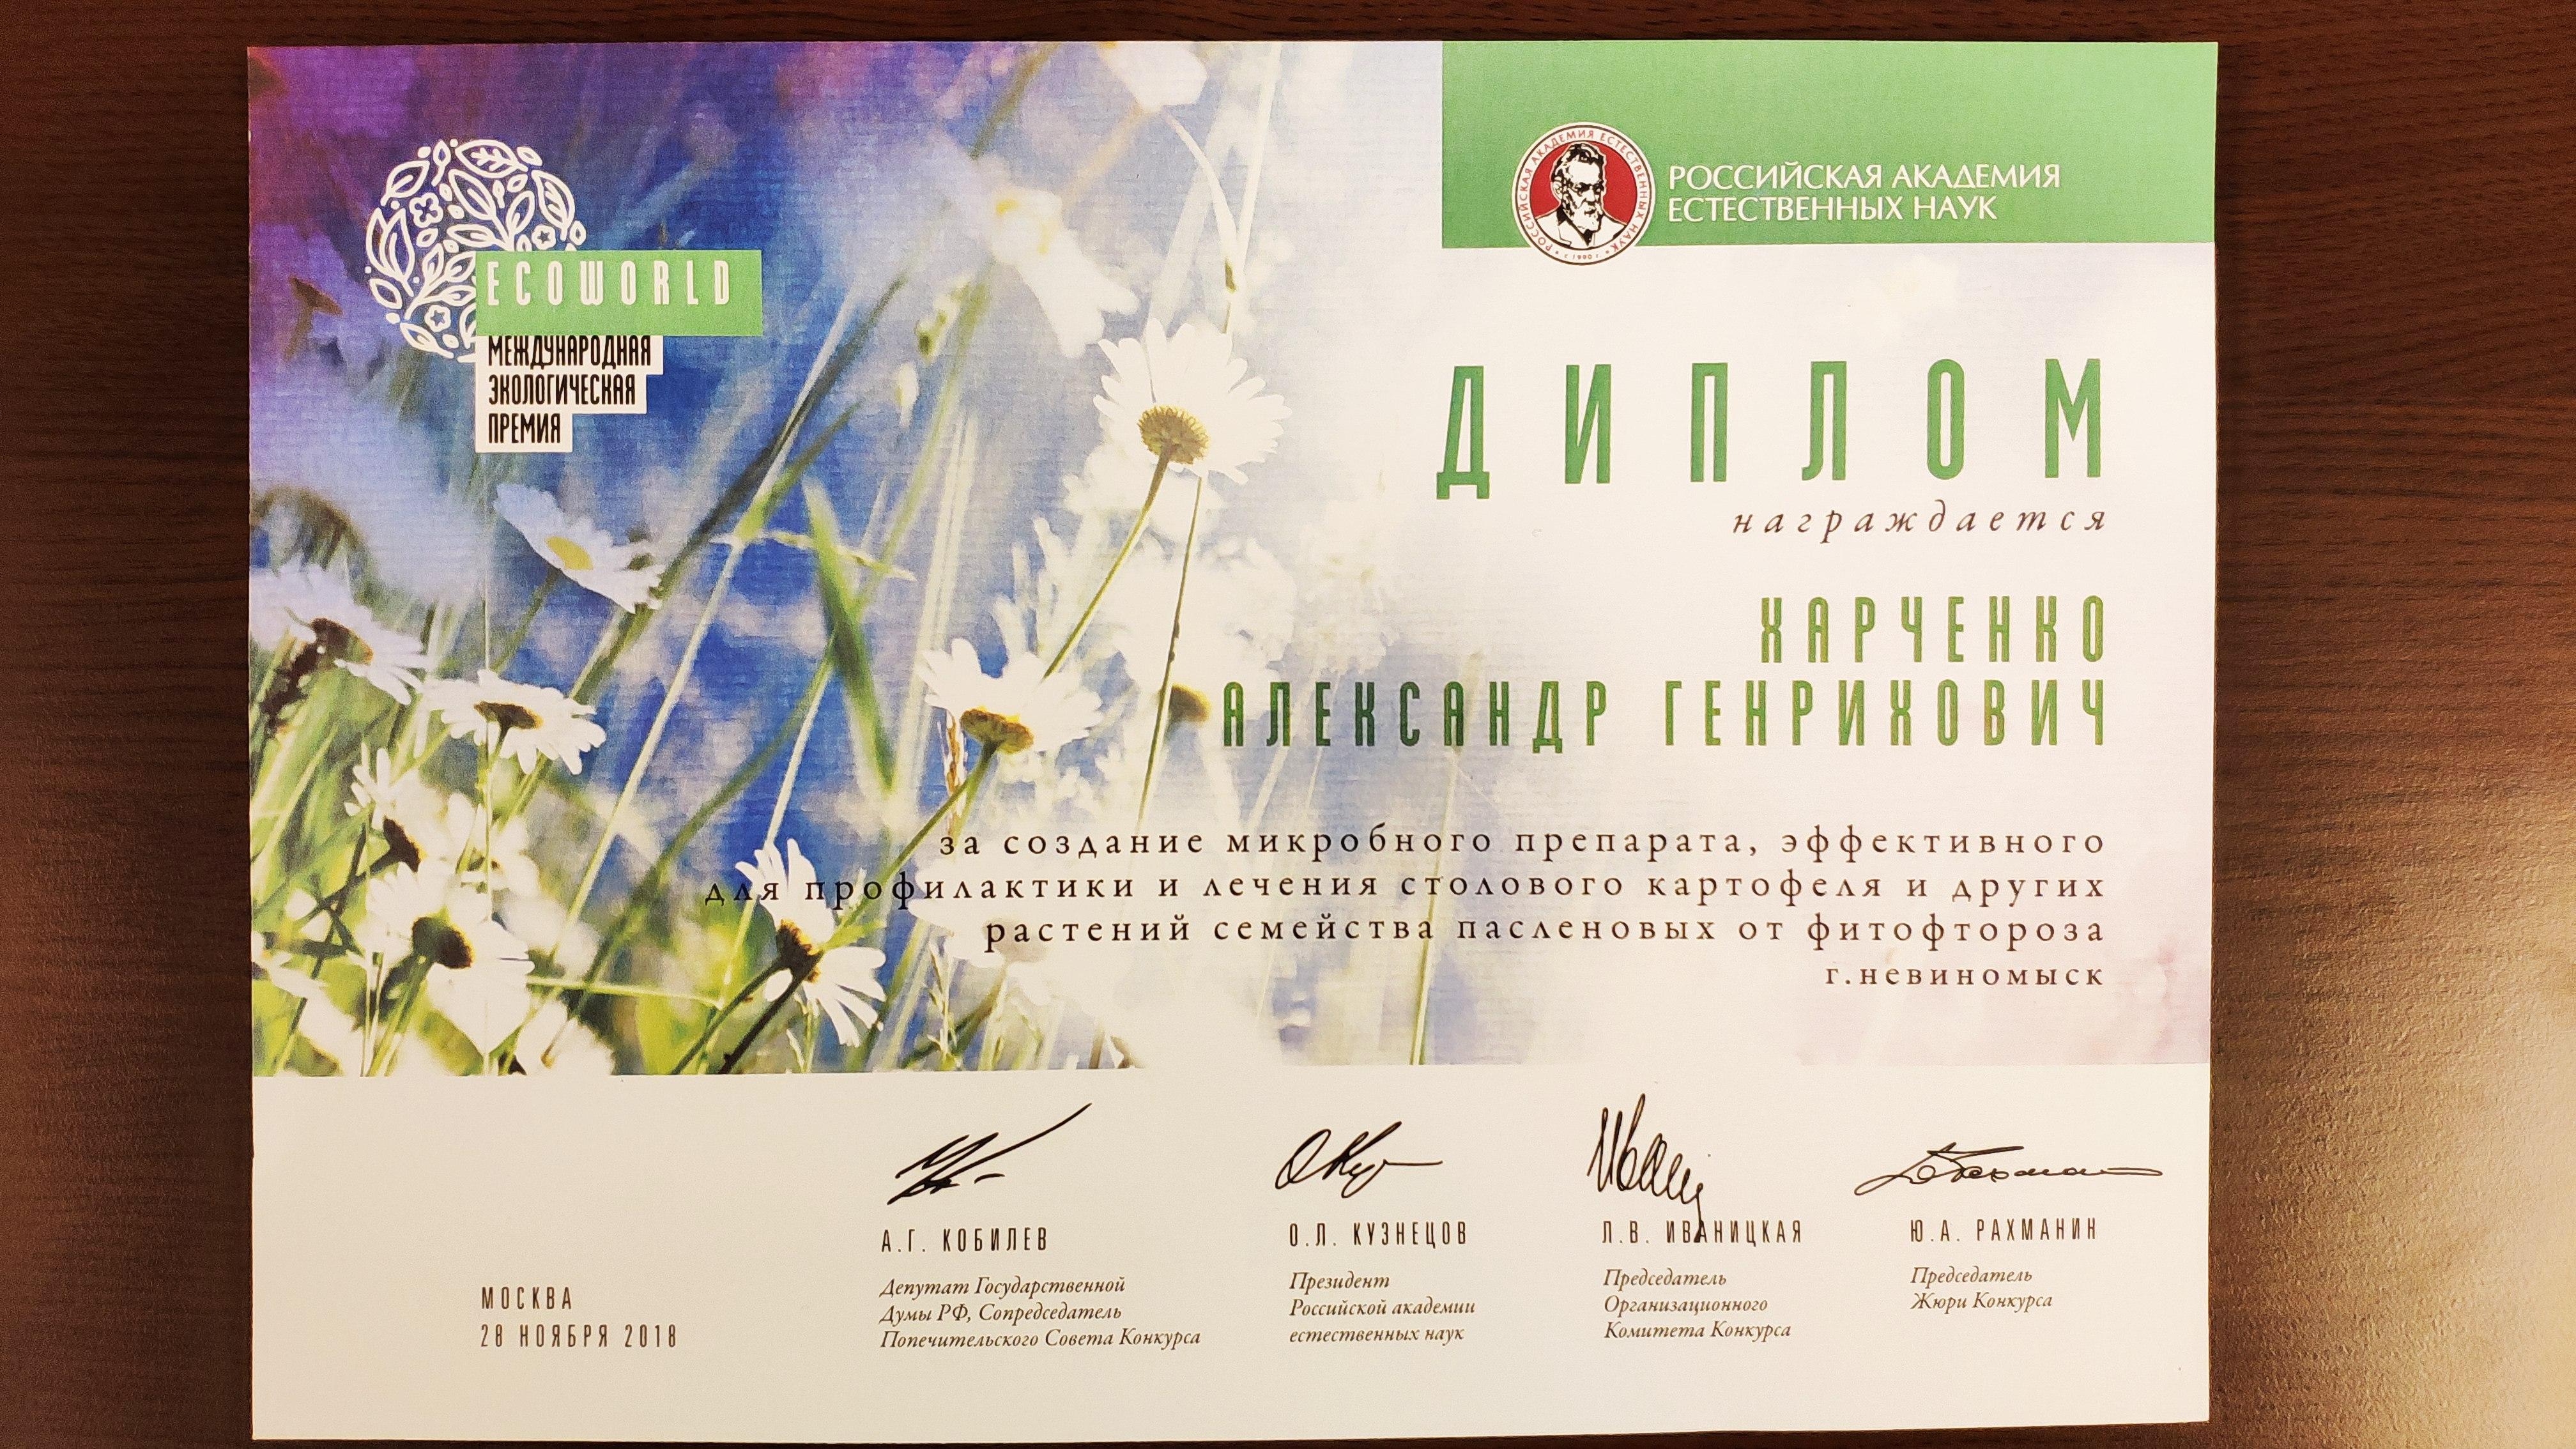 Александр Харченко удостоен международной премии «EcoWorld» 2018 за создание микробного препарата от фитофтороза